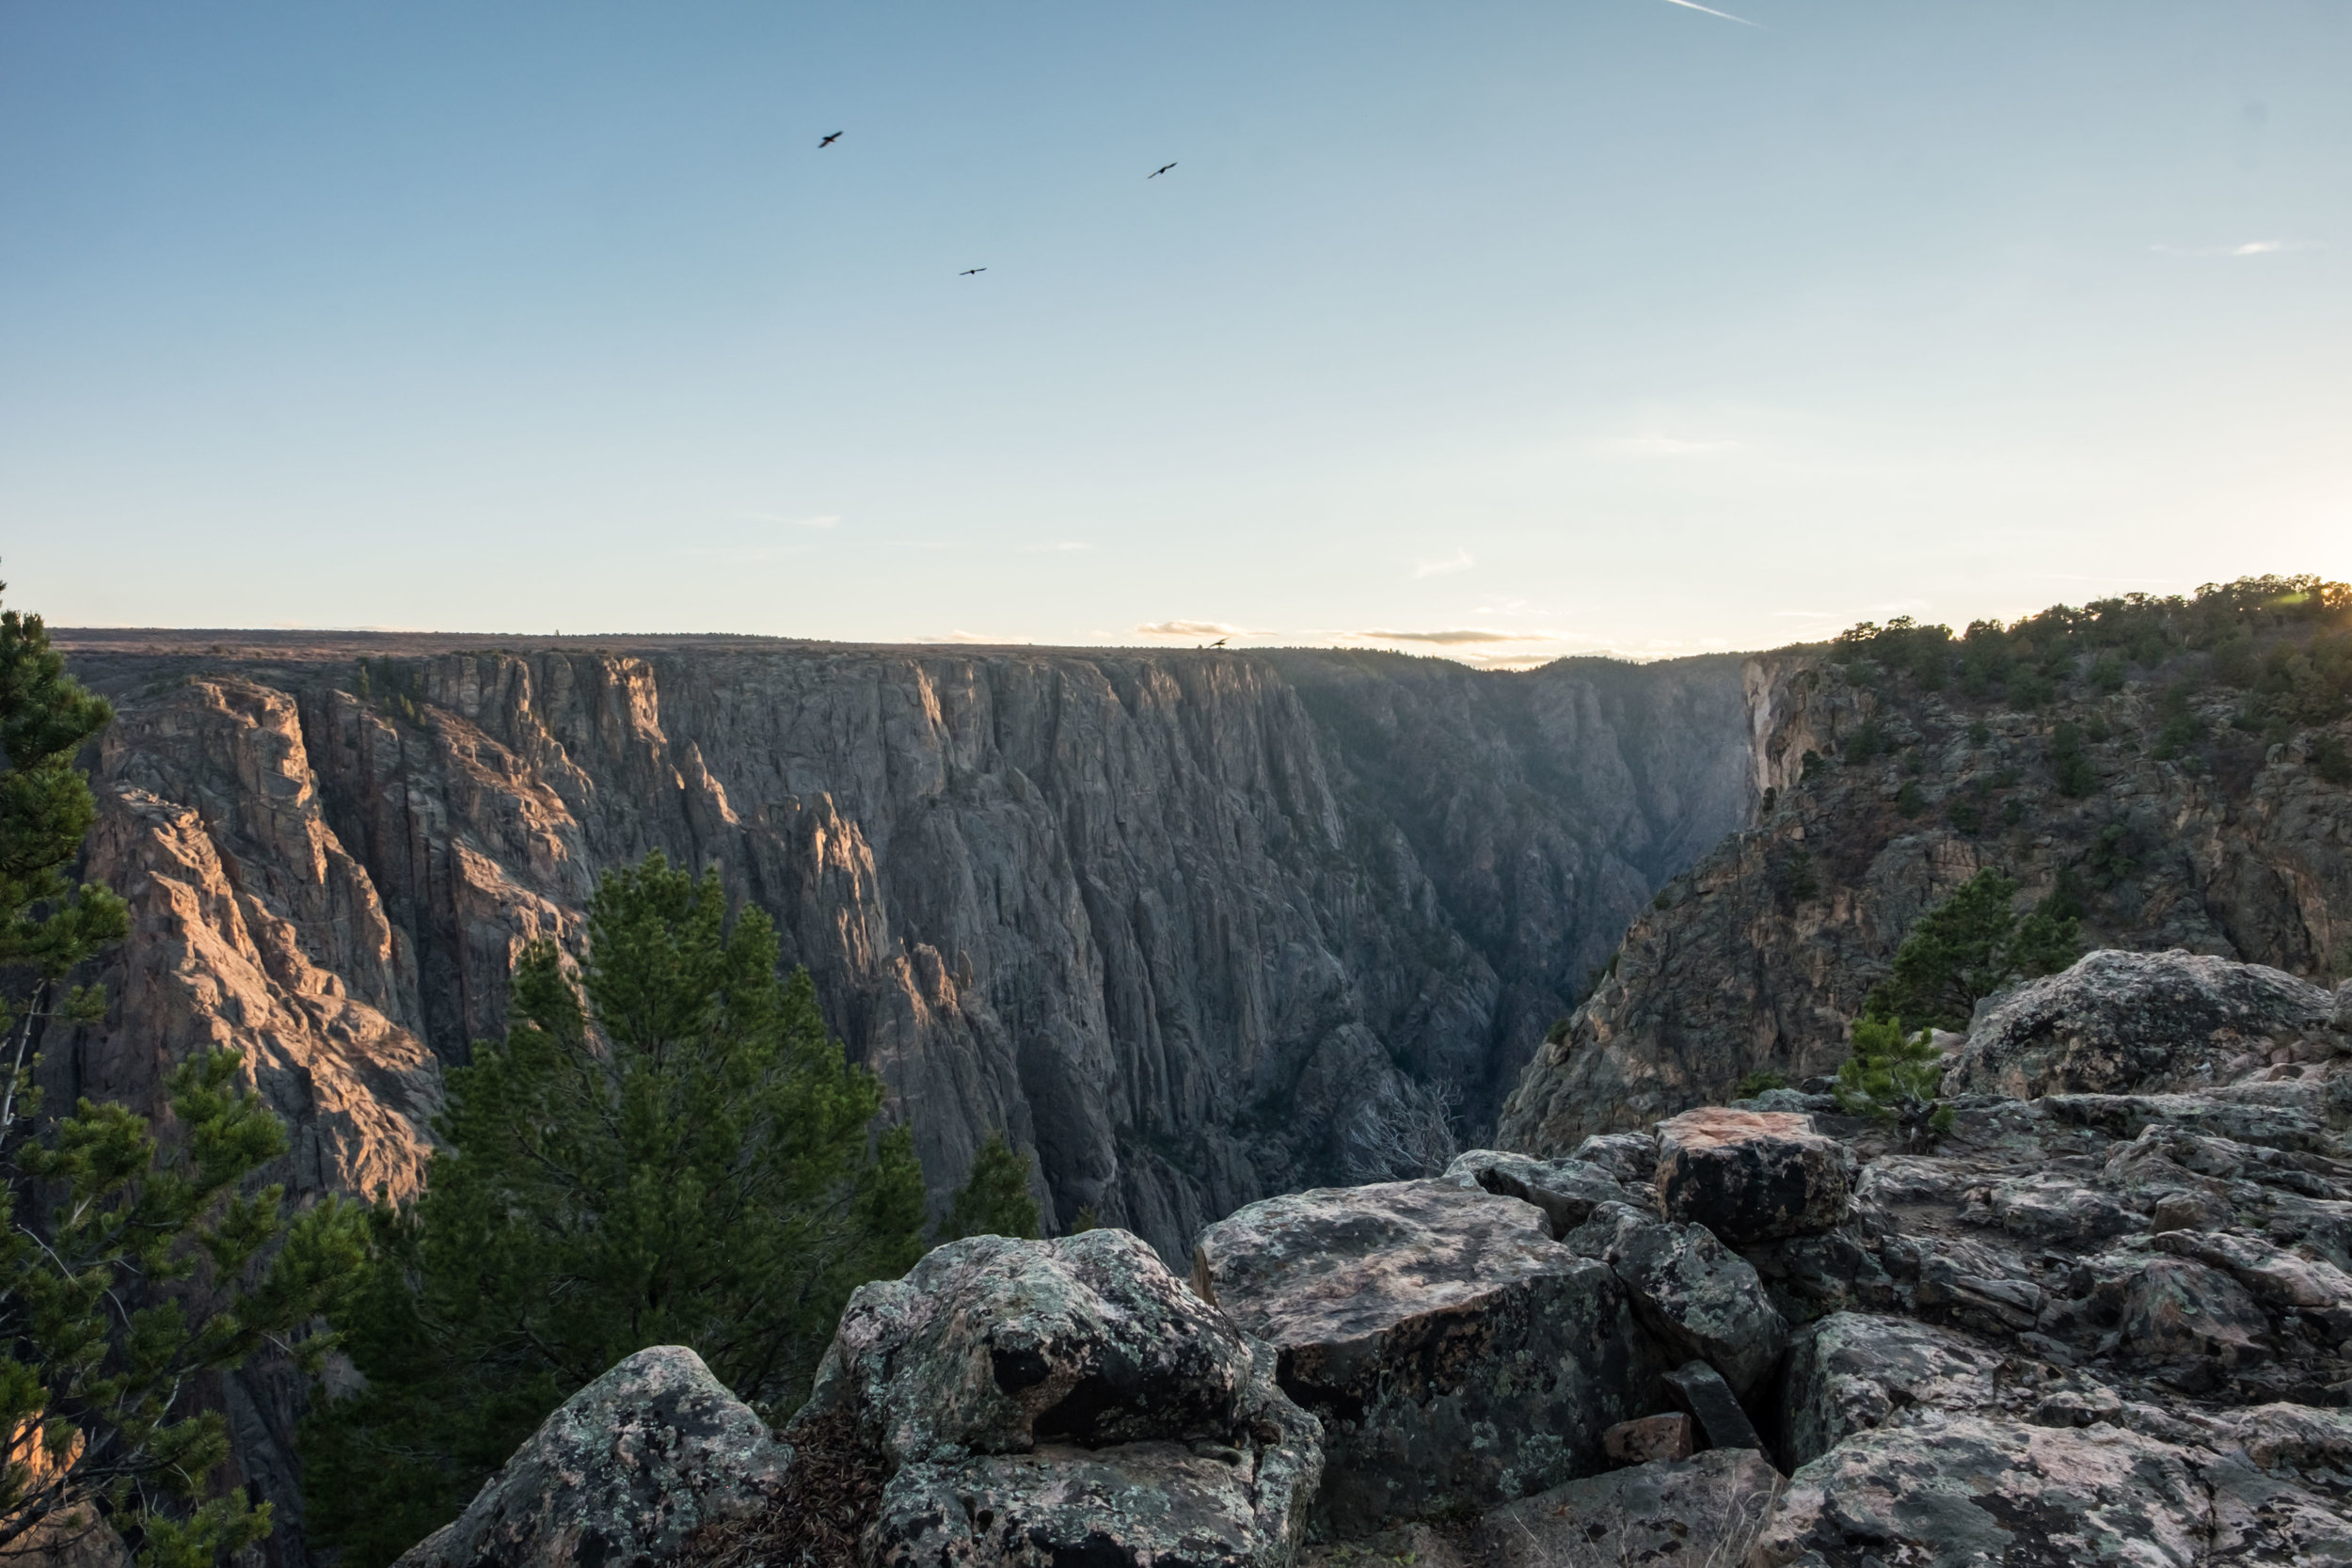 Black Canyon of the Gunnison National Park - 059.jpg